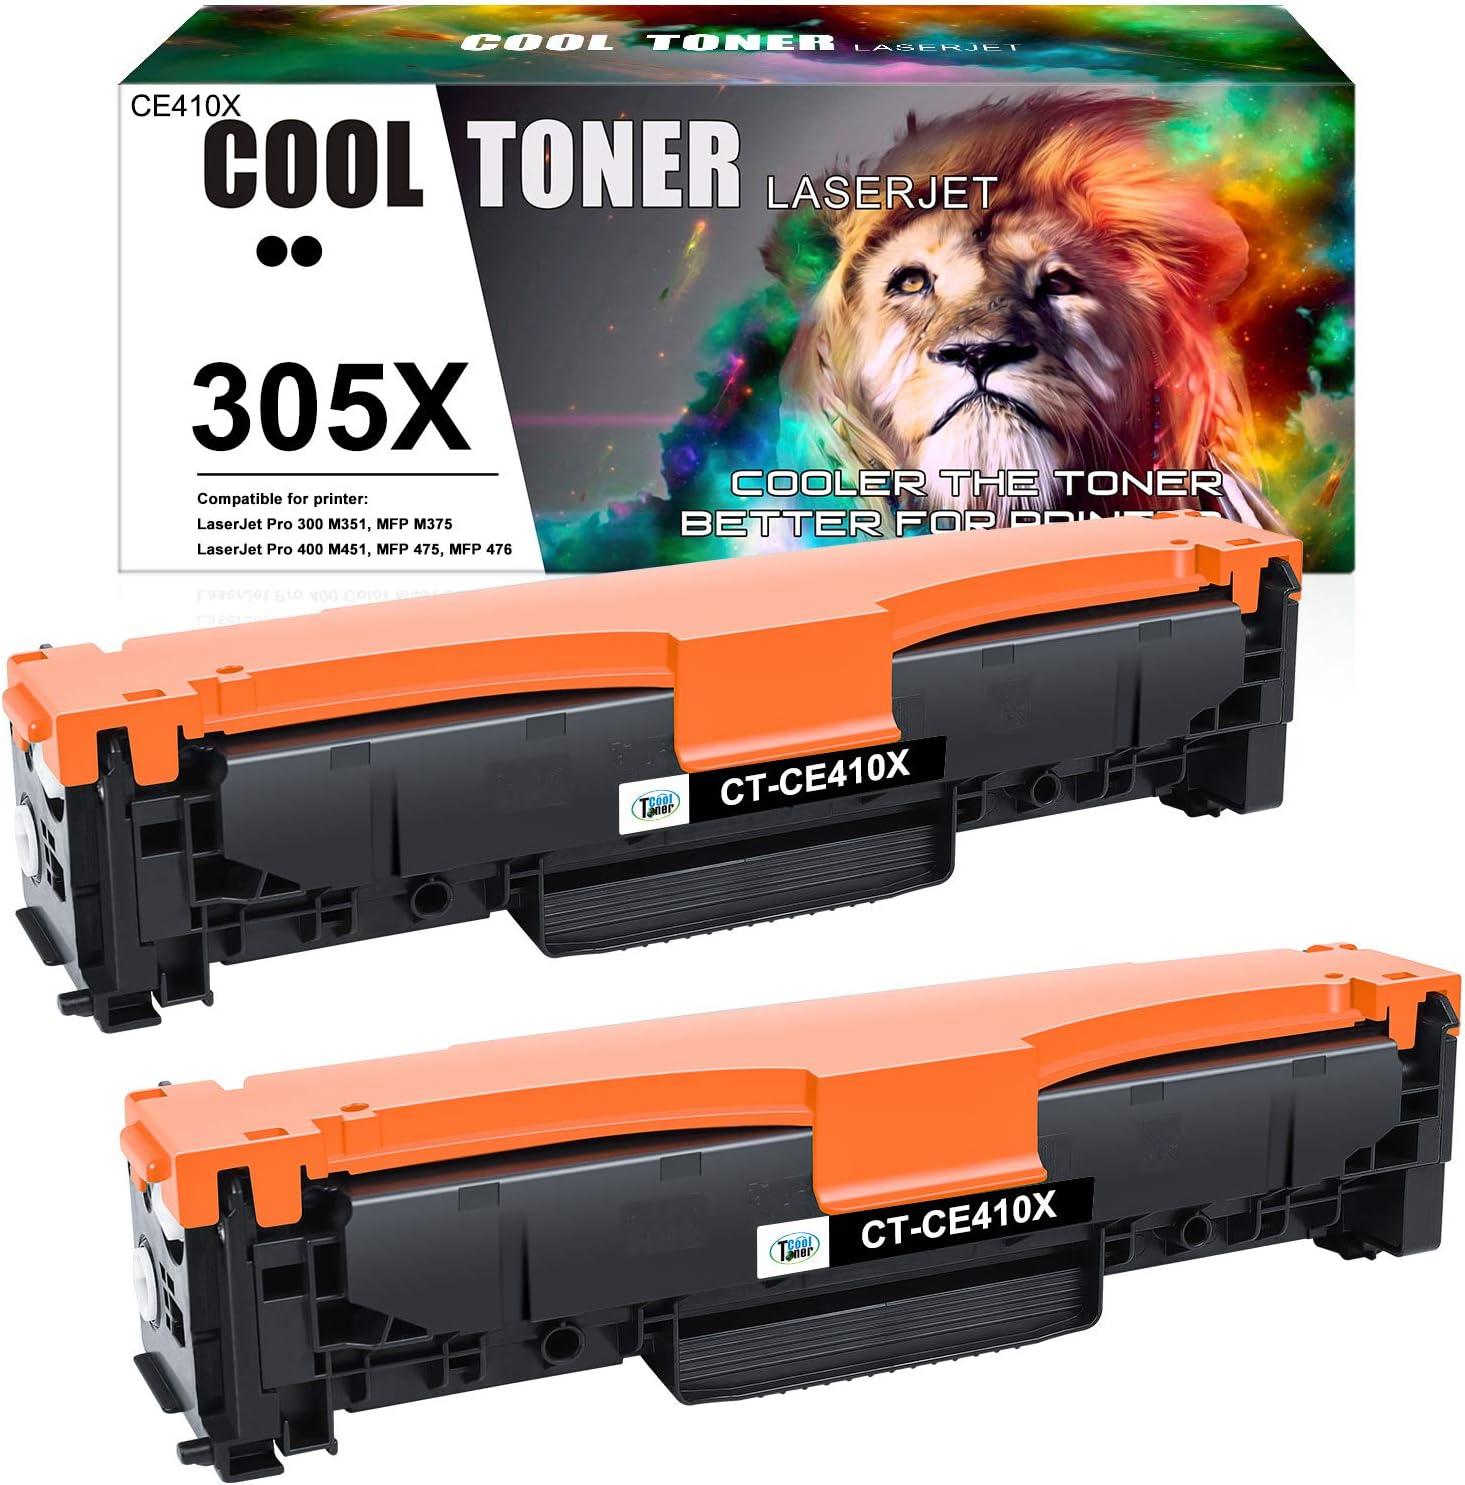 Cool Toner Compatible Toner Cartridge Replacement for HP 305A 305X CE410X CE410A HP Laserjet Pro 400 Color Toner M451dn M451nw M475dn M476nw M476dw M476dn M451dw M375nw M475dw (Black, 2-Pack)